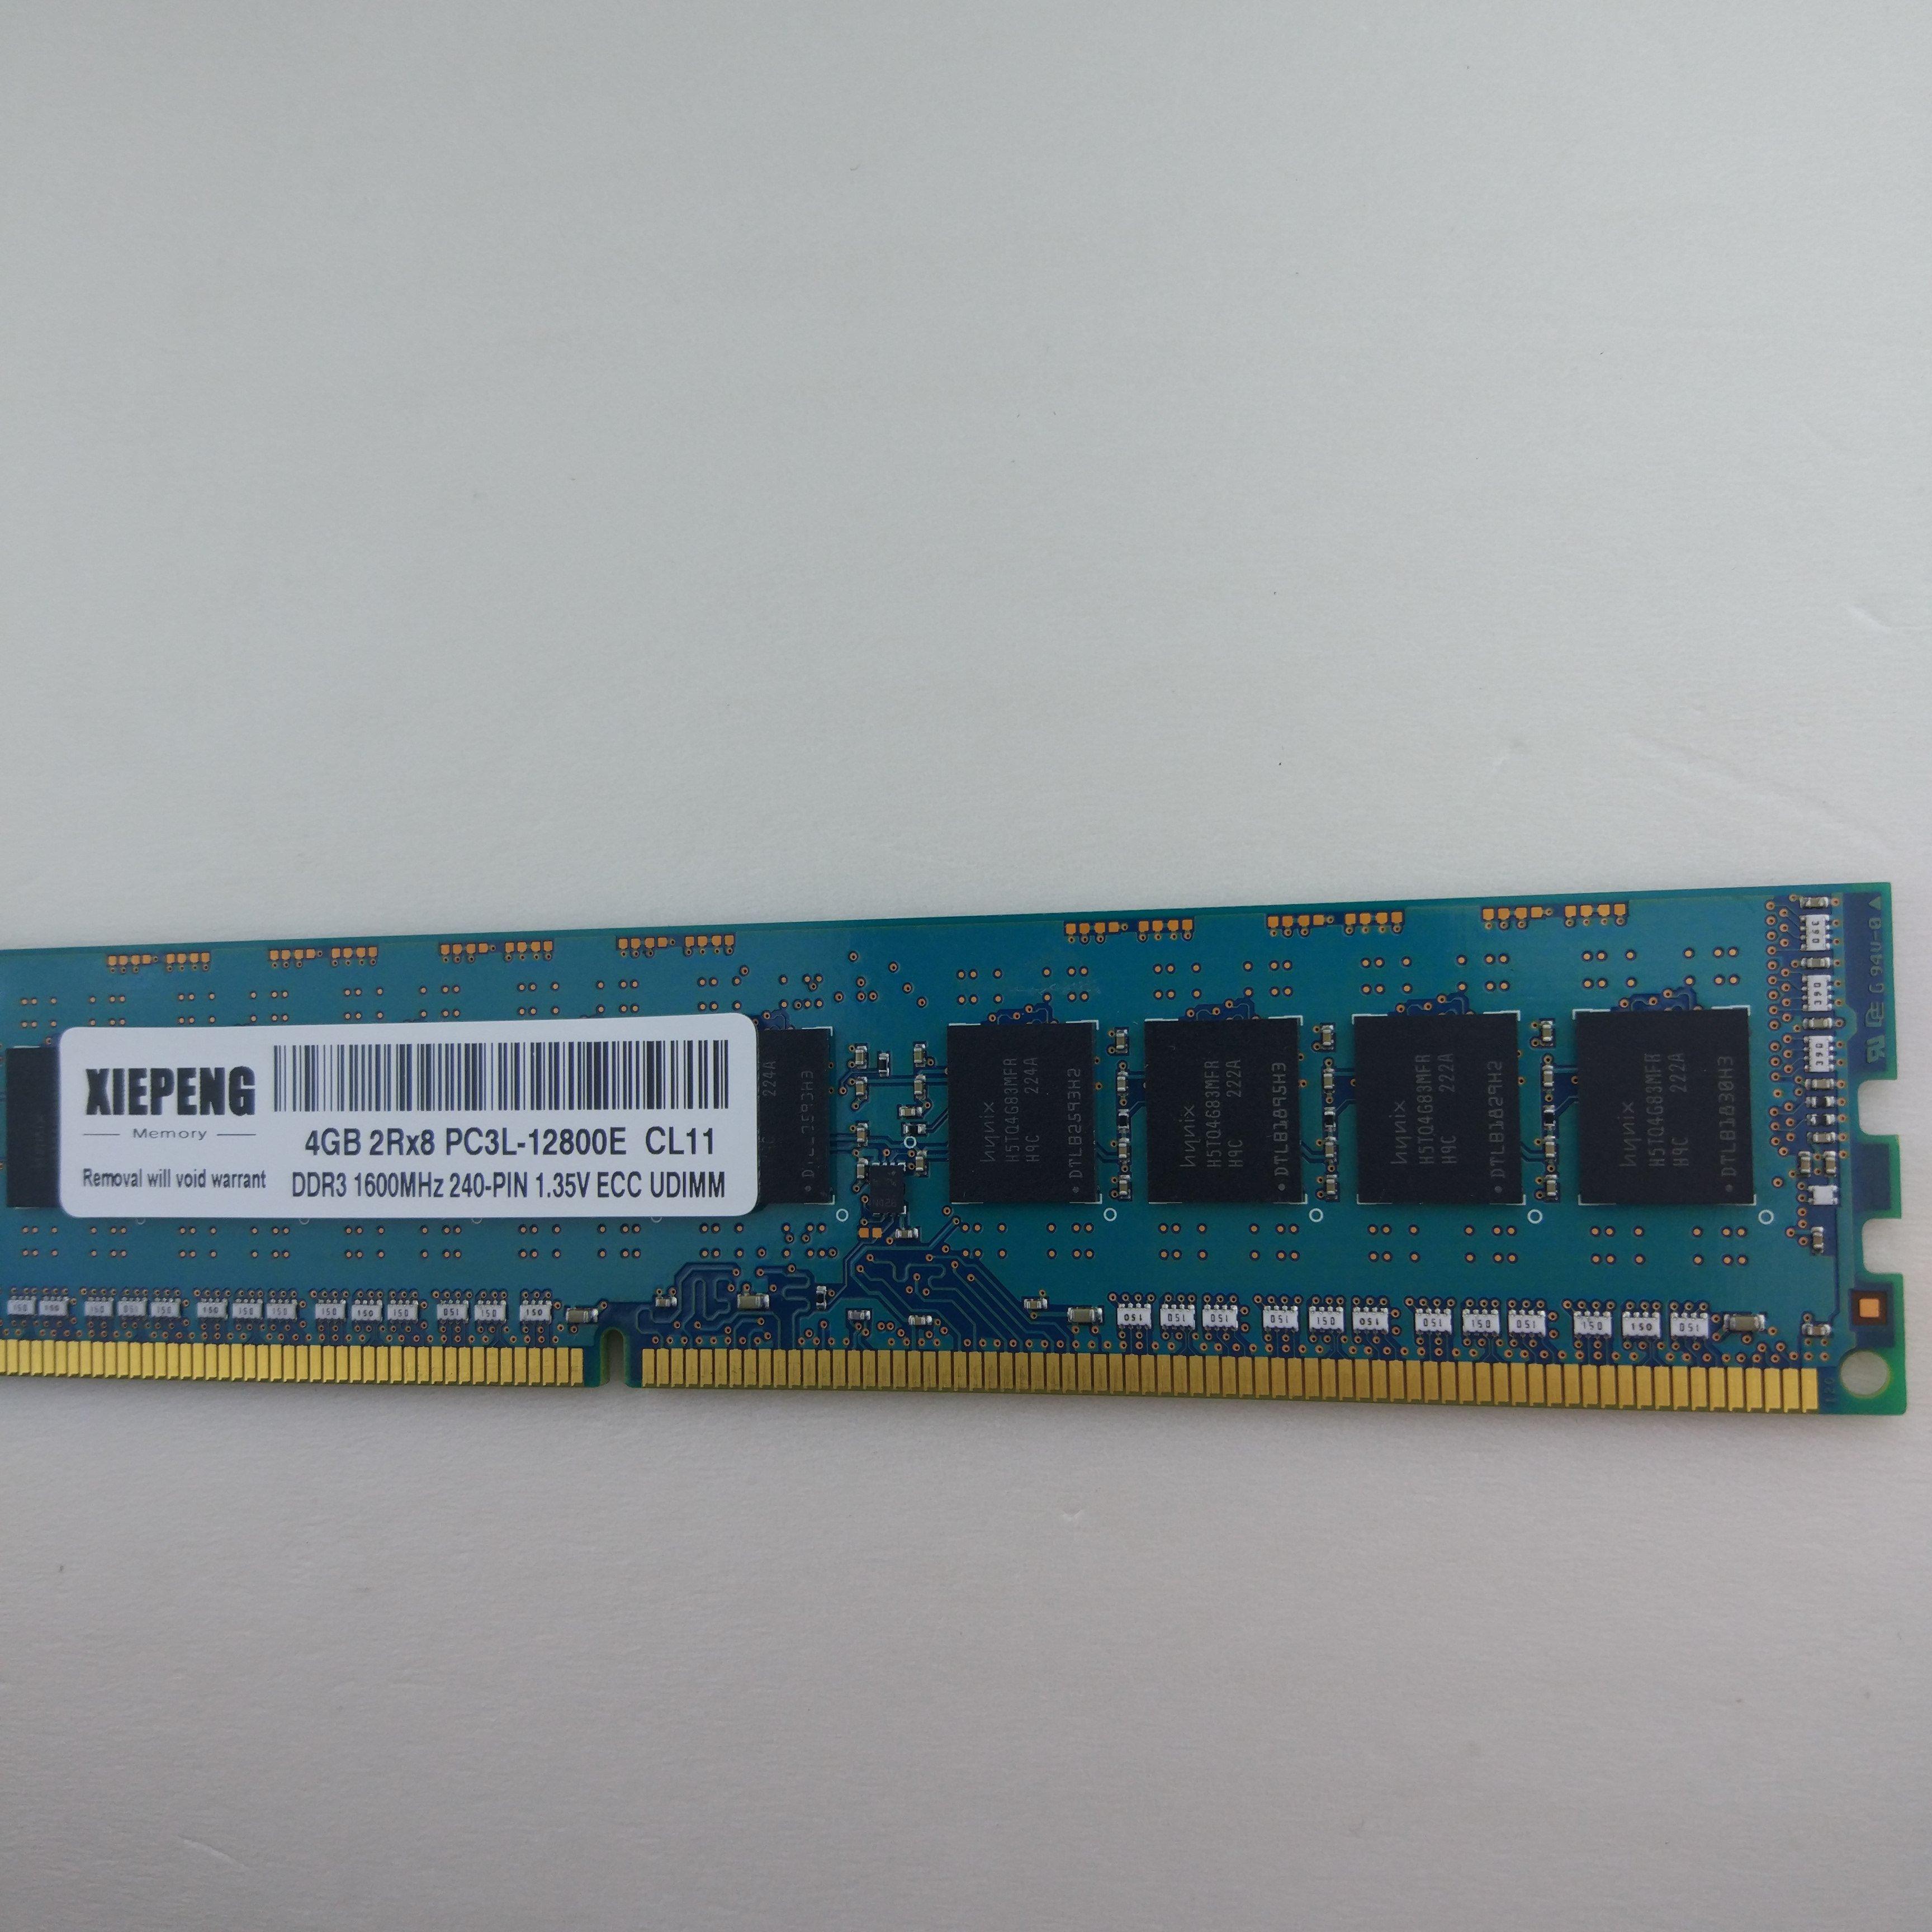 Für Dell PowerEdge C6220 II T320 T420 T620 workstation RAM 8 GB DDR3 1600 MHz Unbuffered DDR3-1600 ECC 4 GB 2Rx8 PC3-12800E Speicher